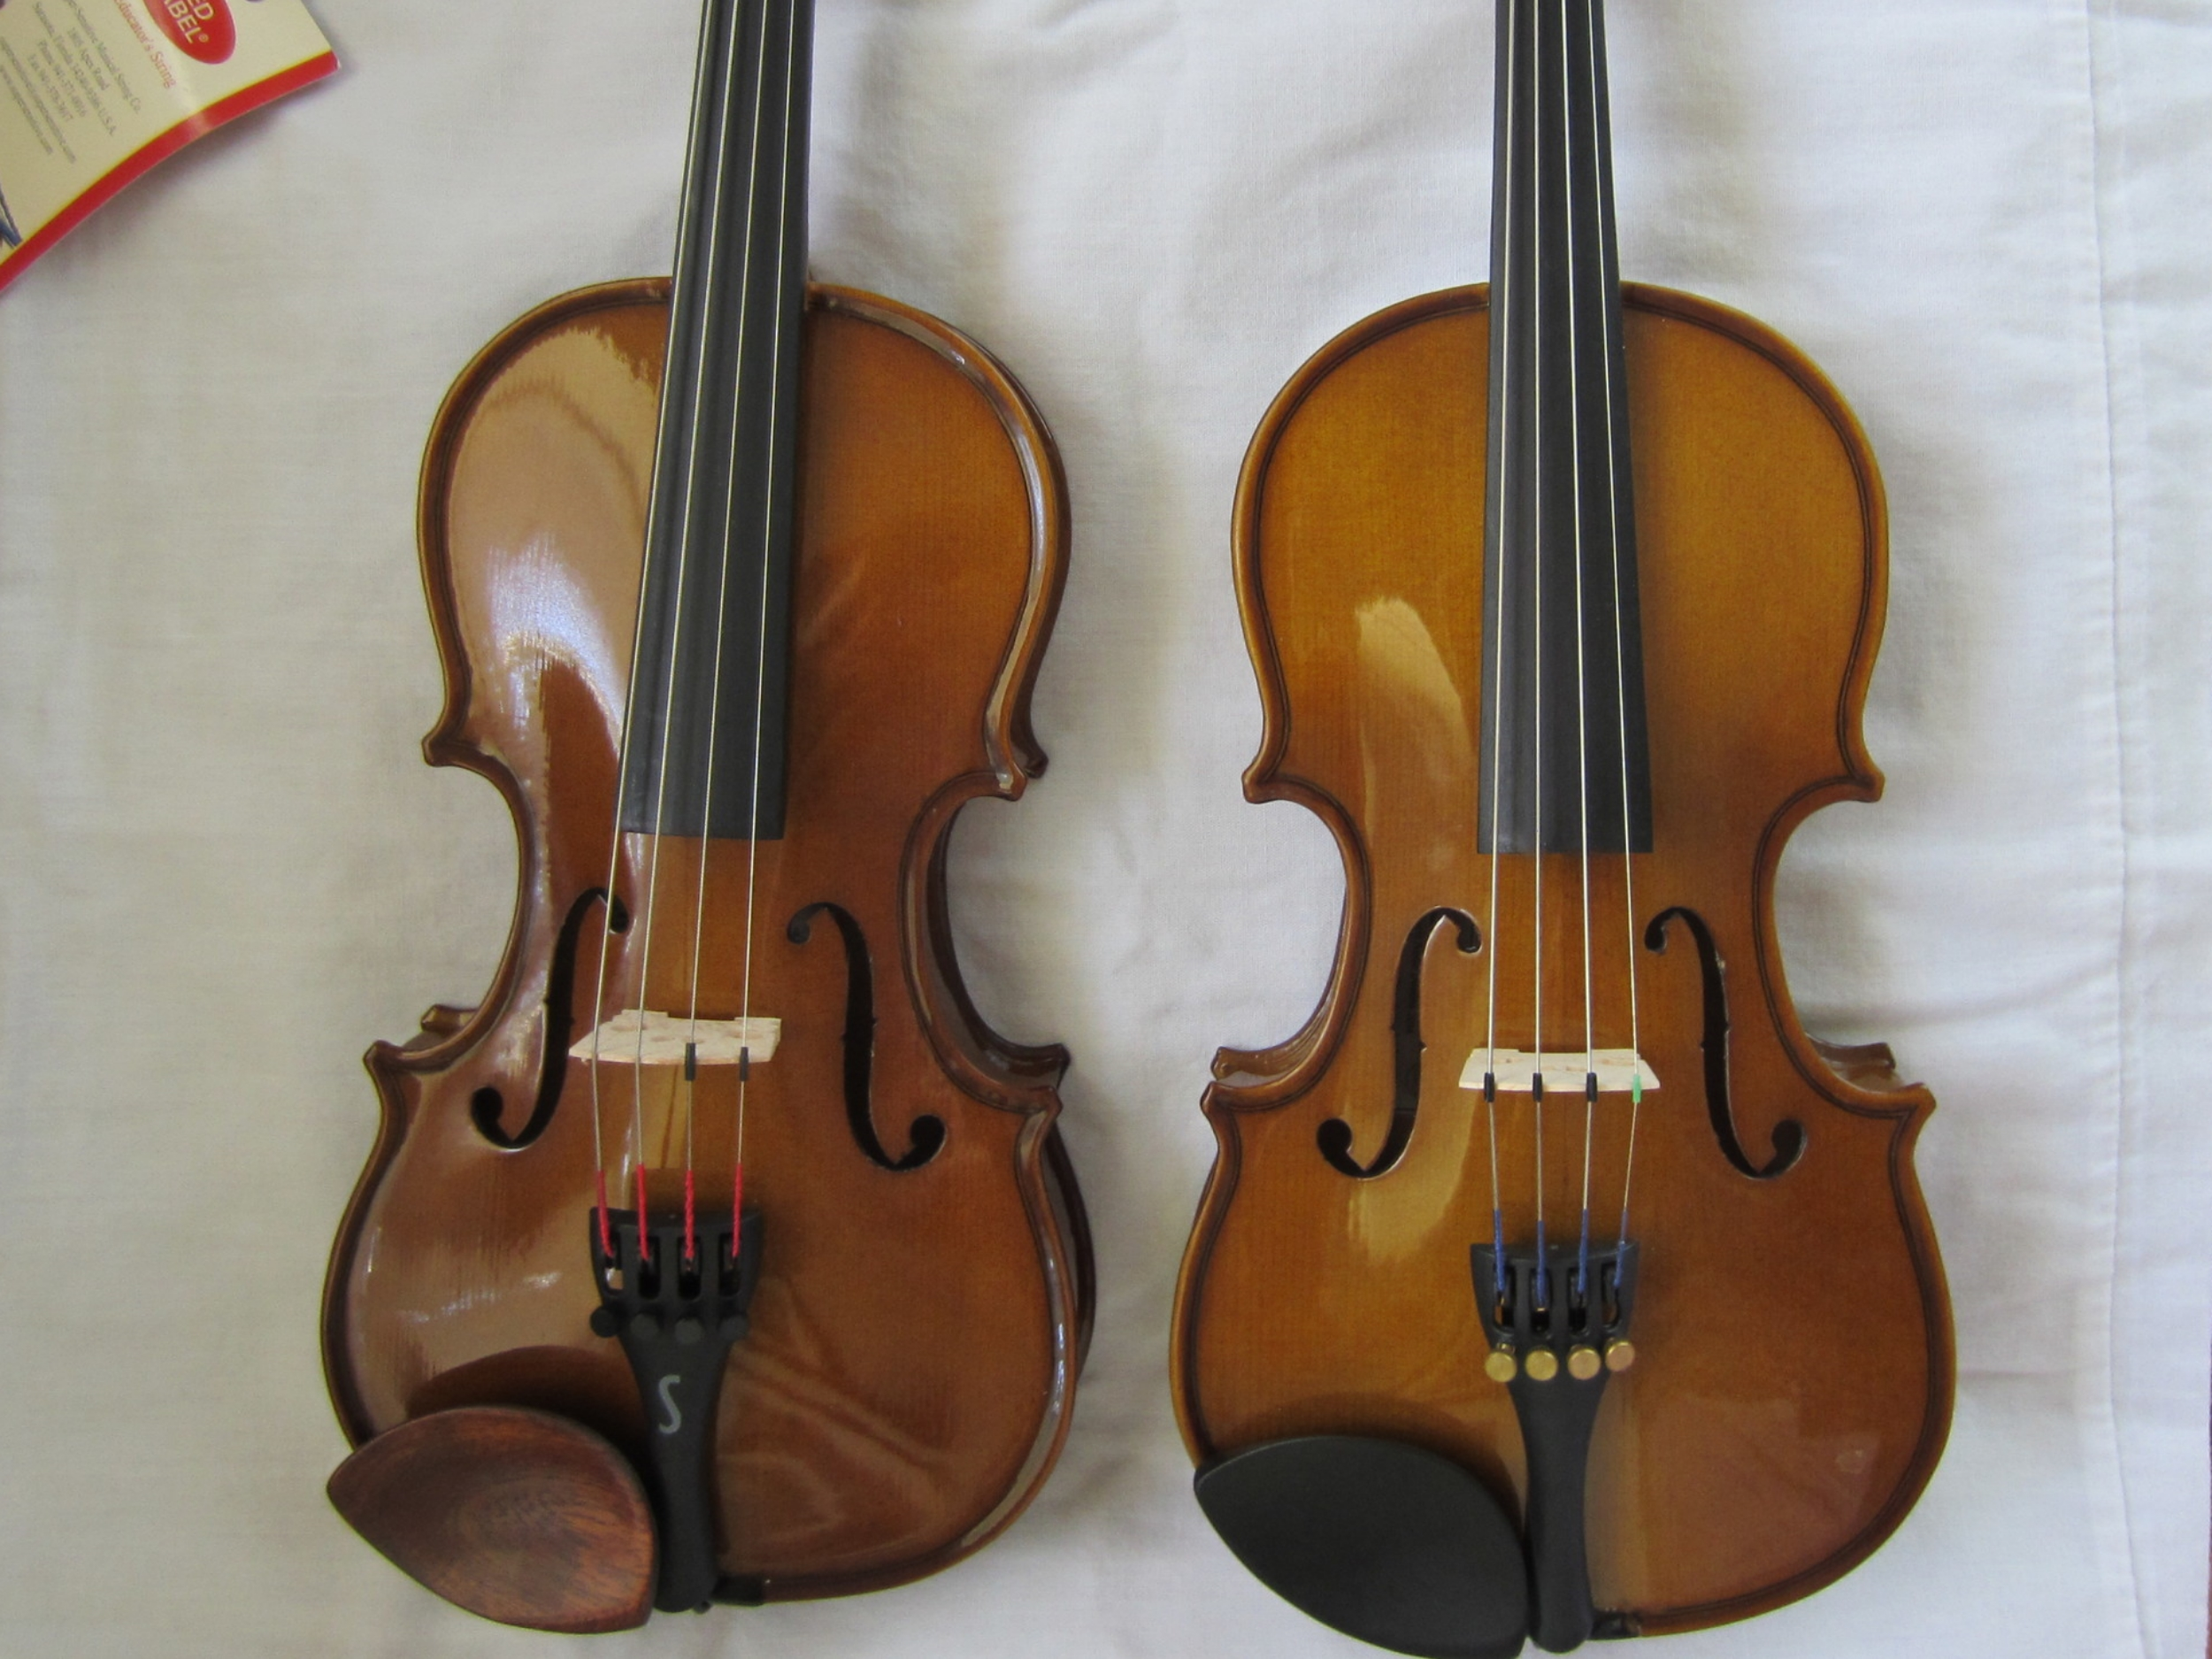 Cremona and Stentor Violins